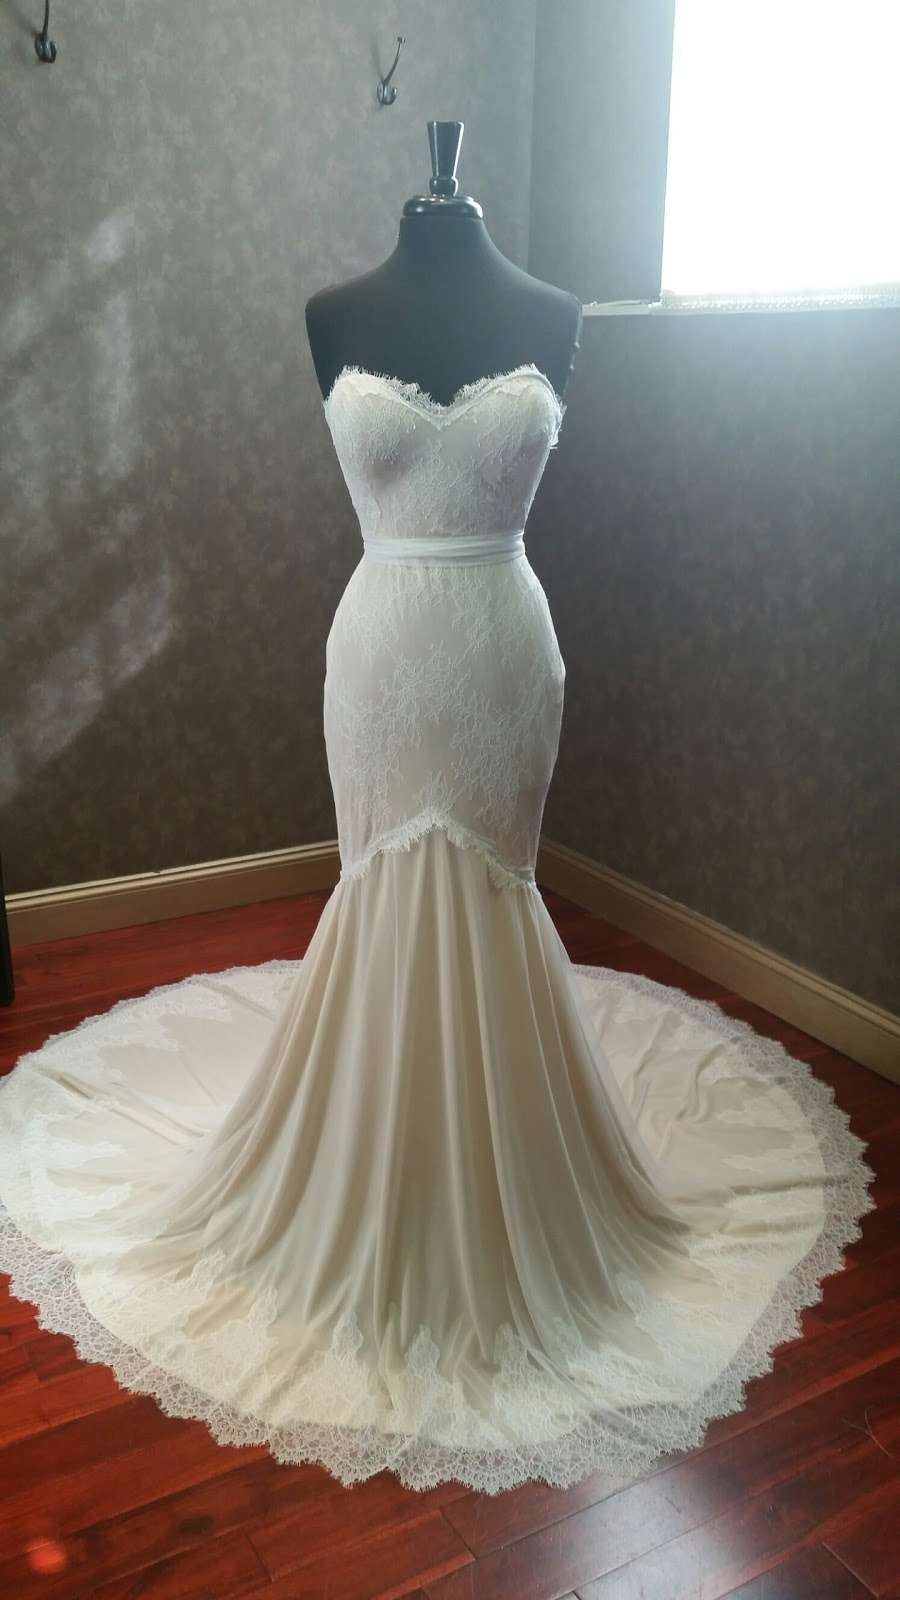 Couture de Bride - clothing store    Photo 7 of 10   Address: 406 Cedar Ln, Teaneck, NJ 07666, USA   Phone: (201) 357-4877